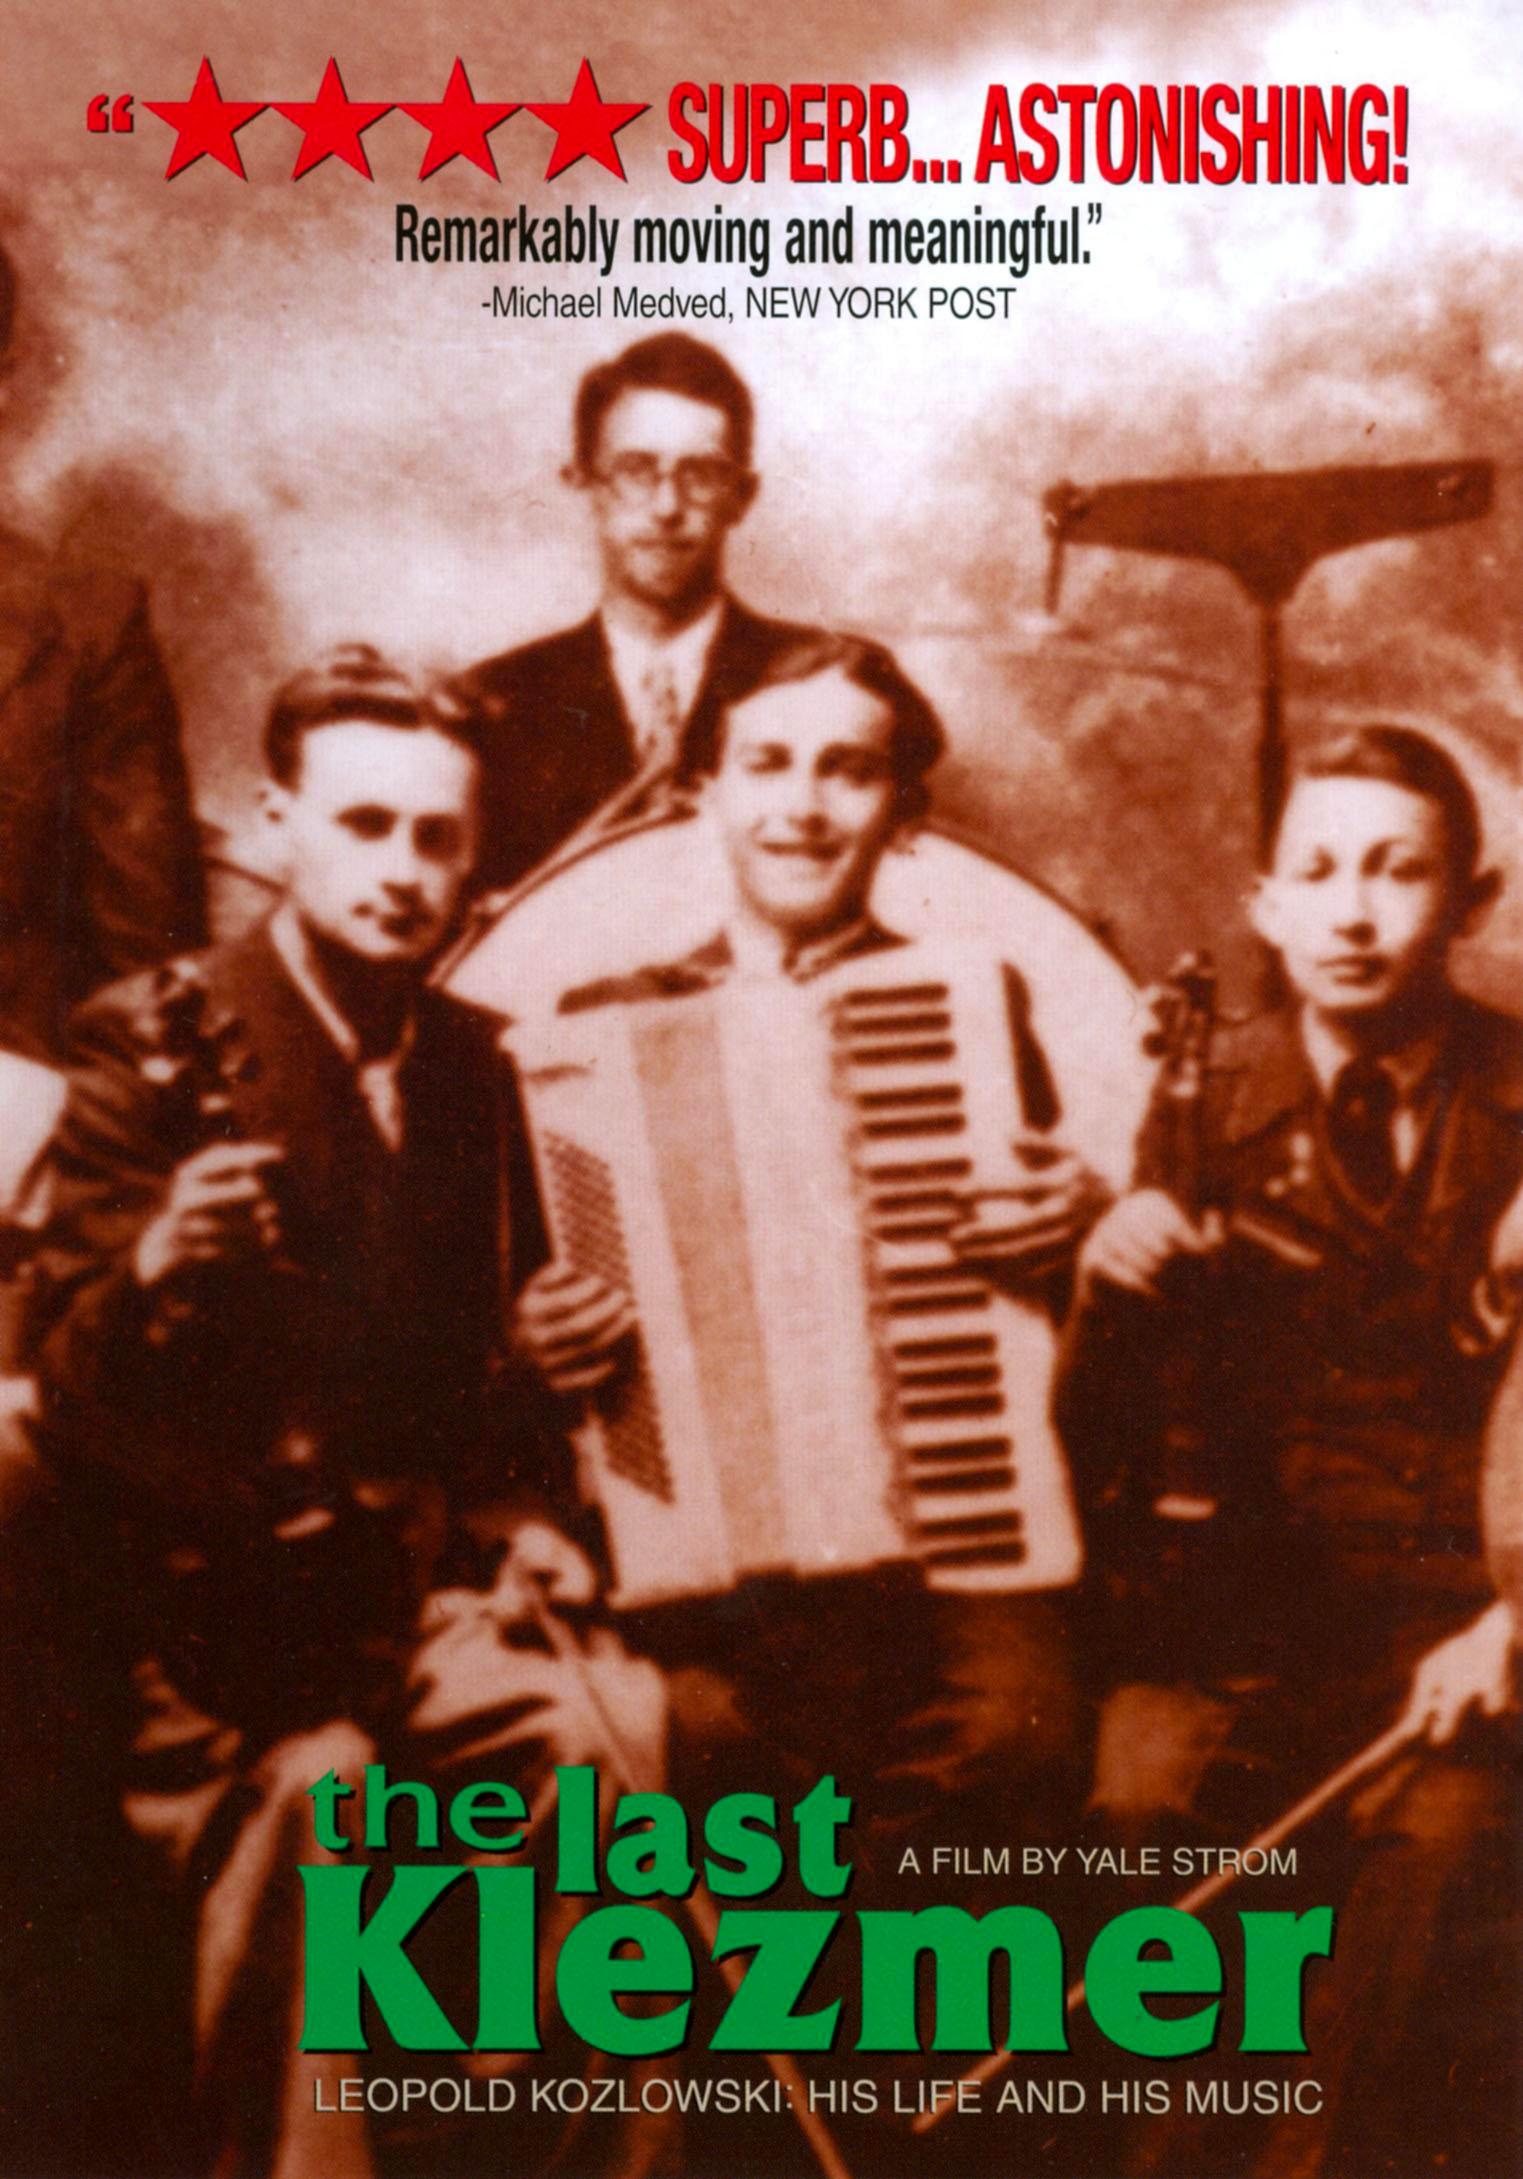 The Last Klezmer: Leopold Kozlowski - His Life and Music